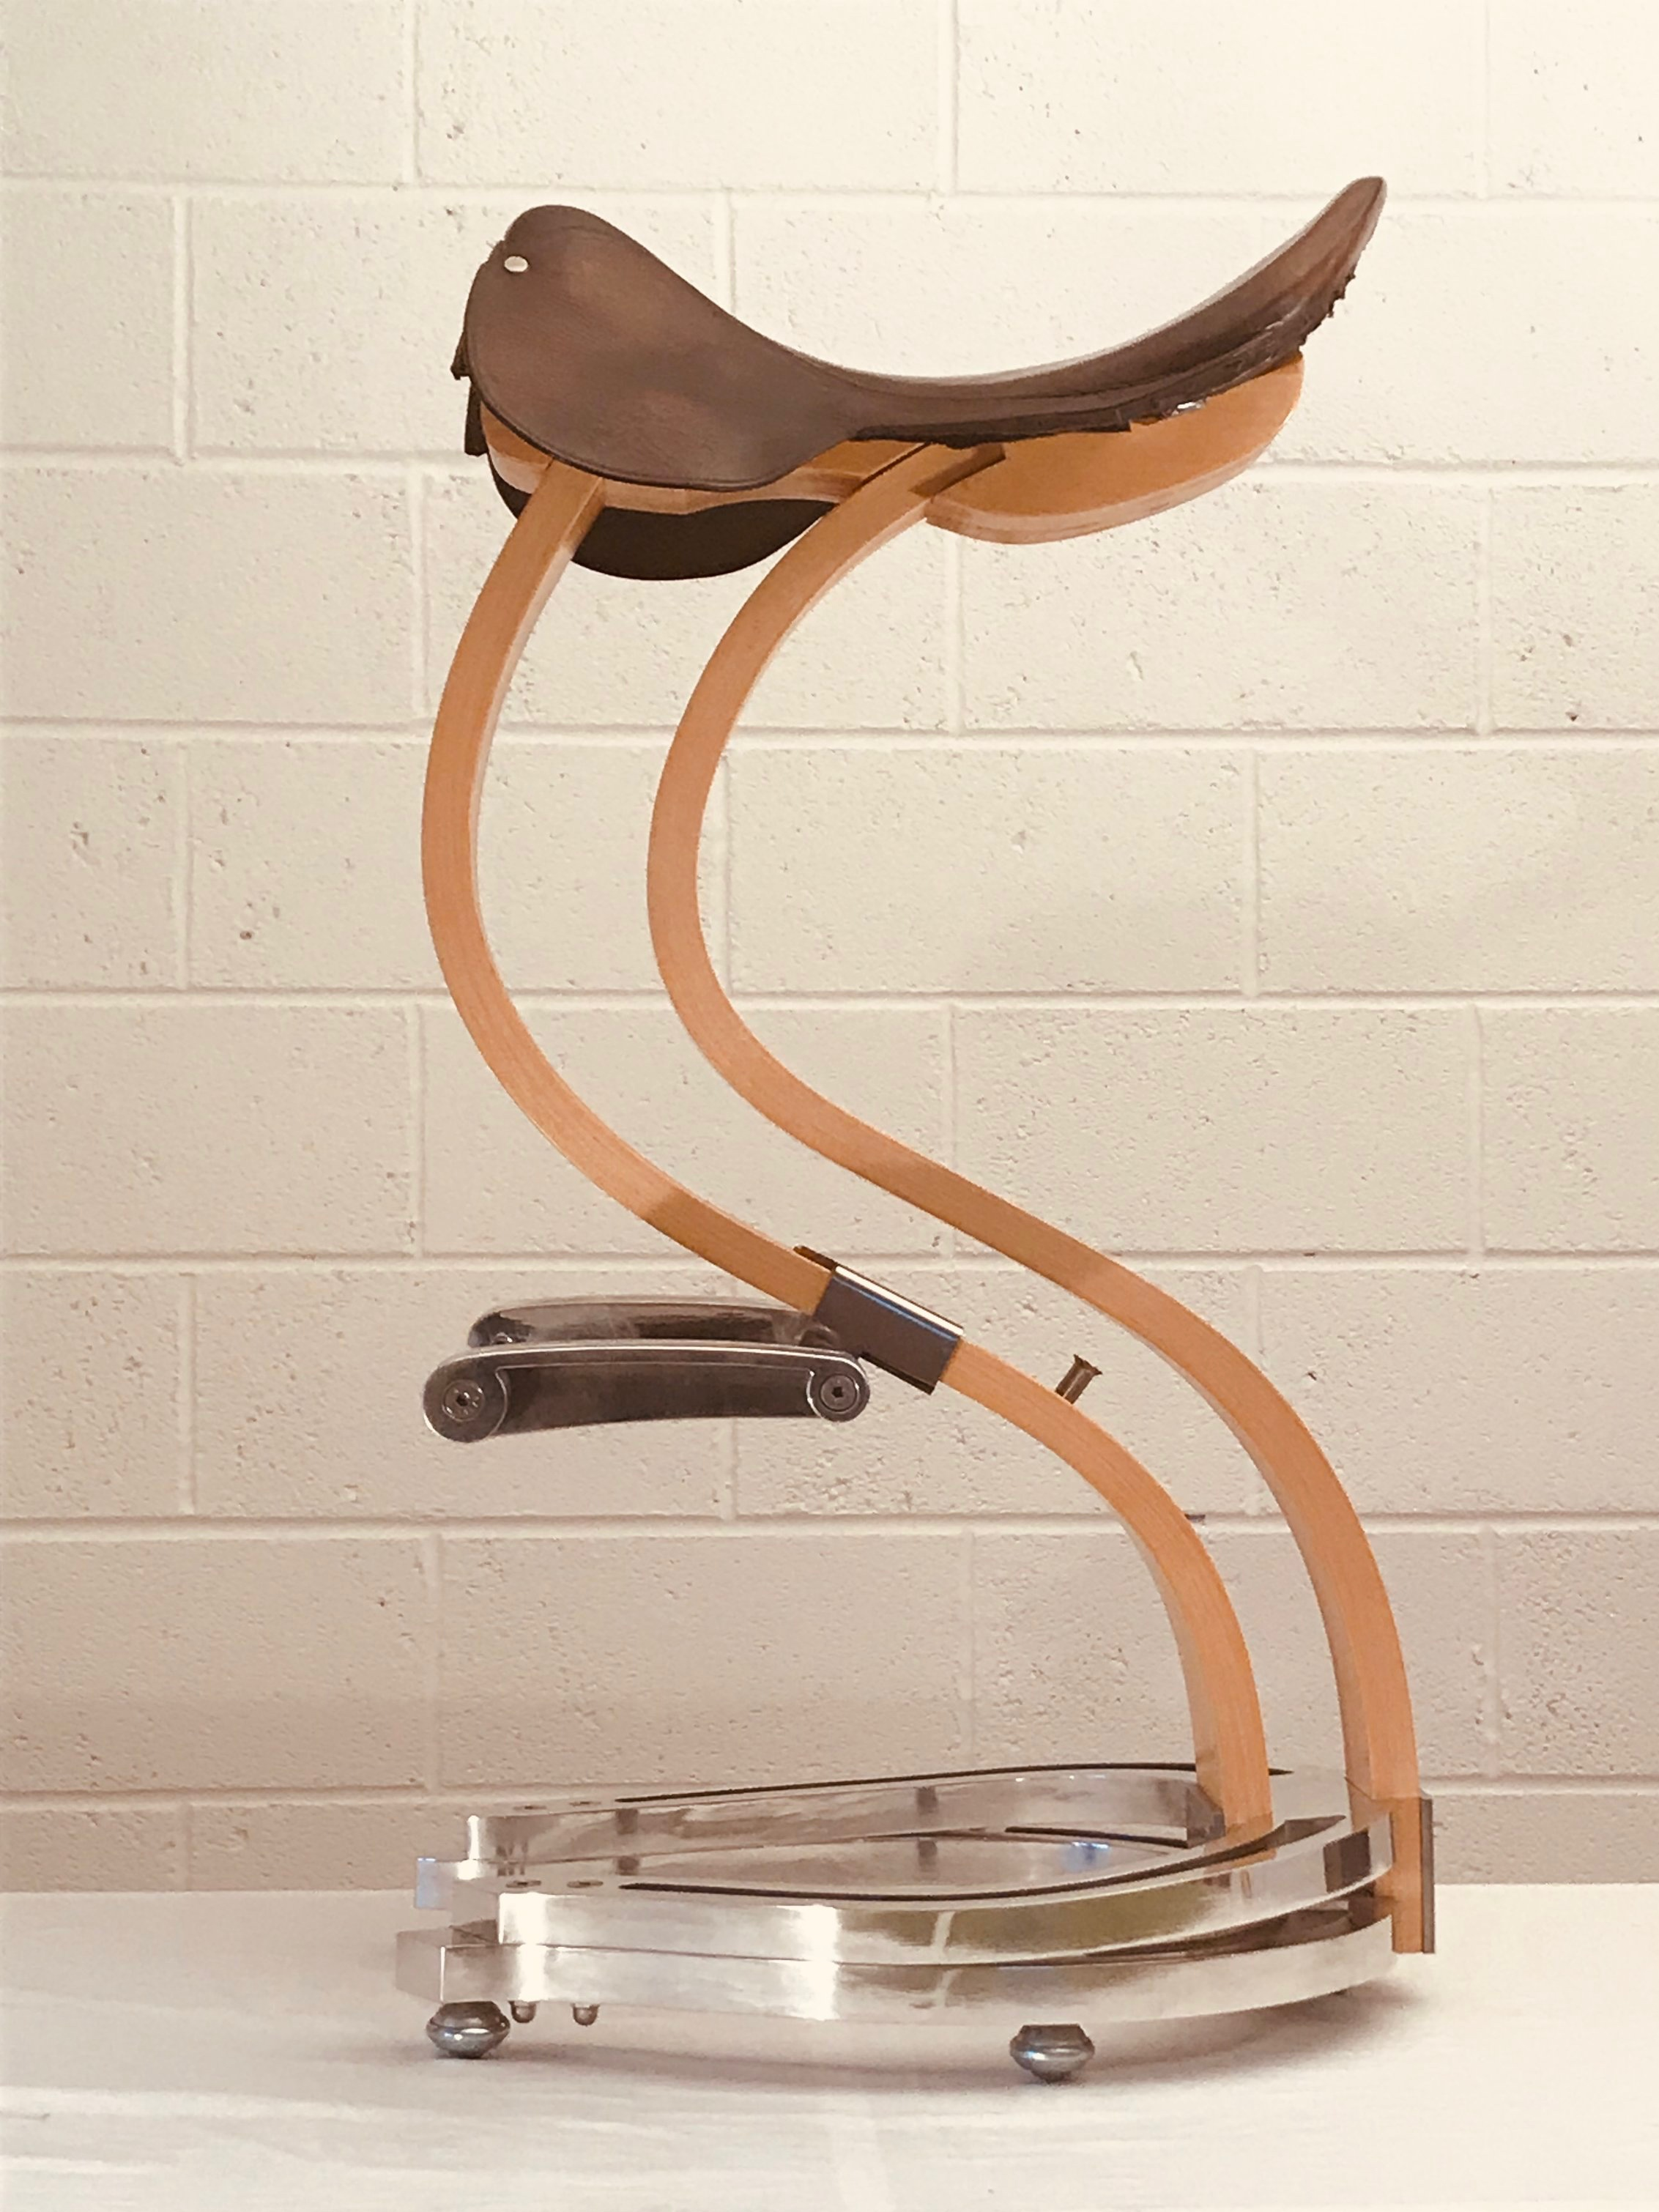 Calvalcióni stool in maple